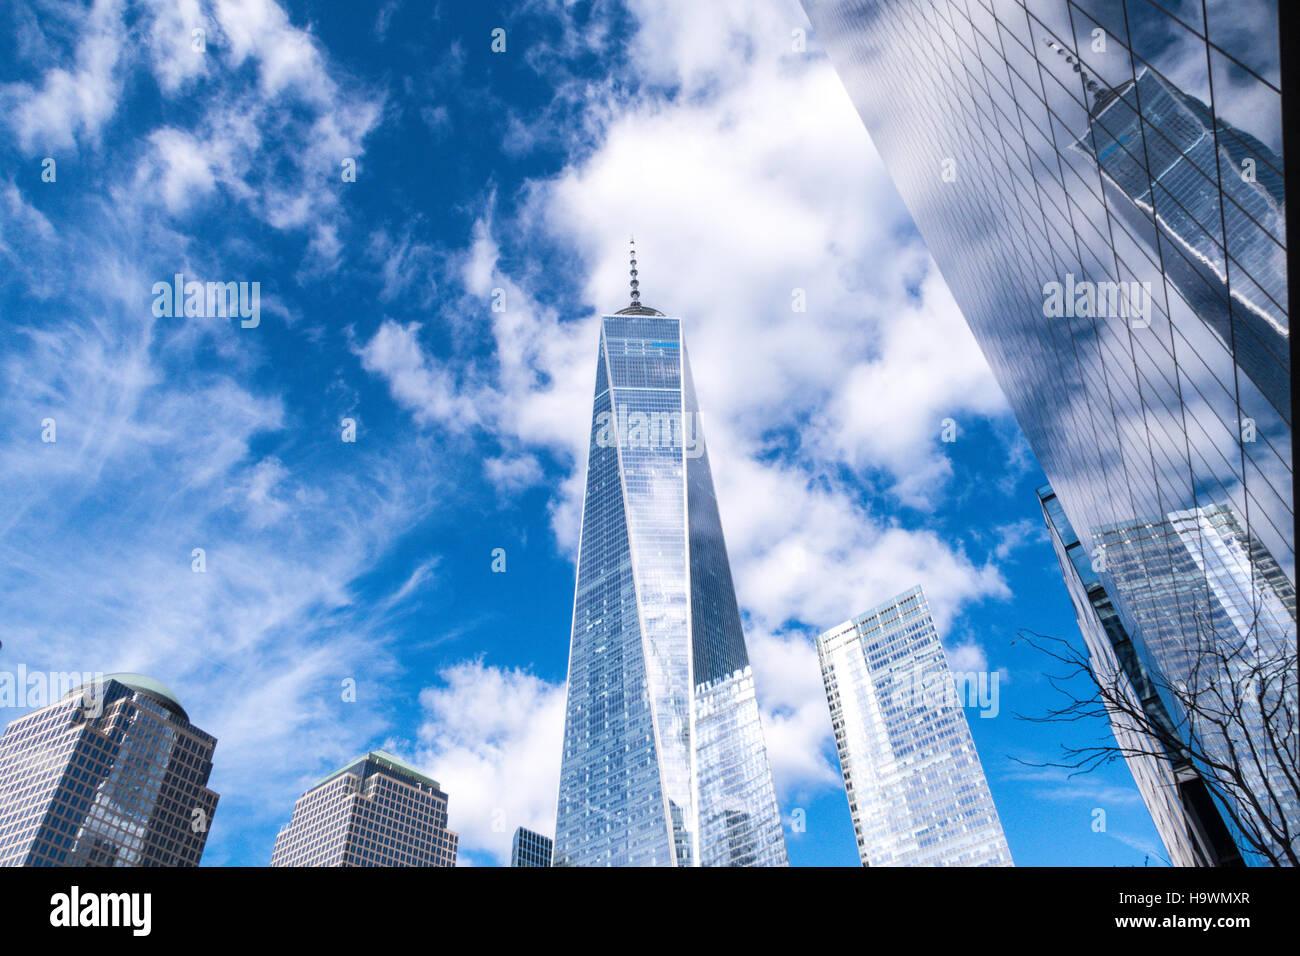 World Trade Center, Lower Manhattan, NYC, USA Stock Photo